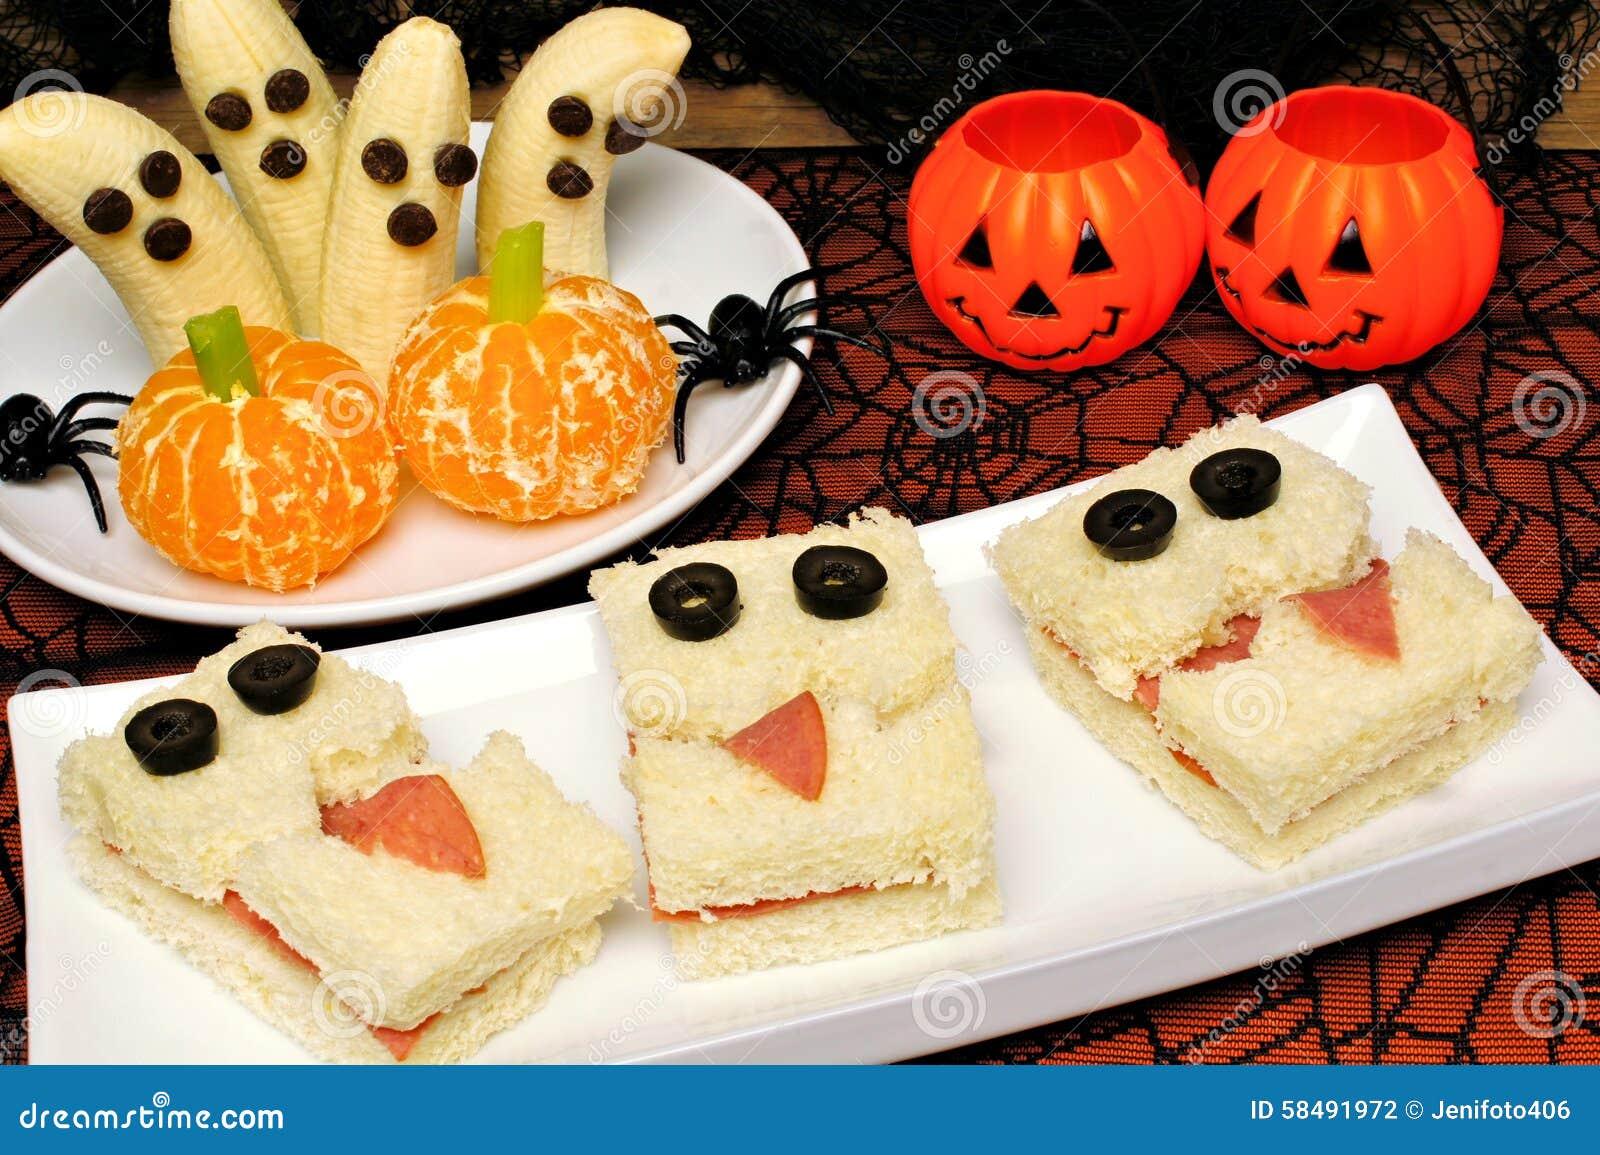 Healthy halloween monster sandwiches banana ghosts and orange pumpkins stock photo image - Idee menu halloween ...